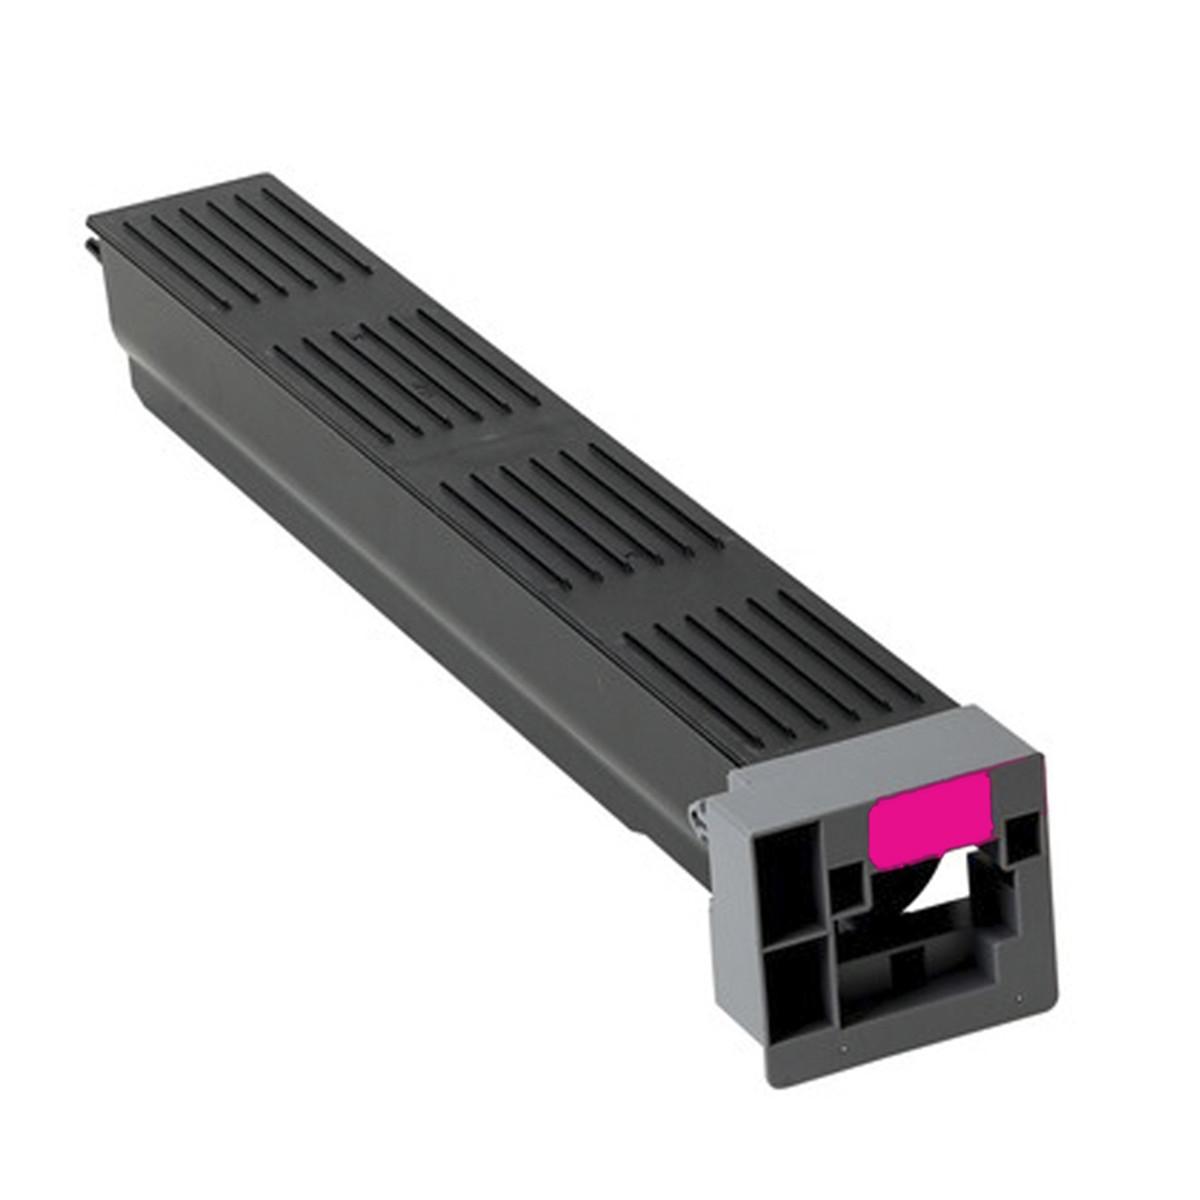 Toner Konica Minolta Magenta | Bizhub C552 C552DS C652 C652DS C452 552DS Katun Business Color 510g